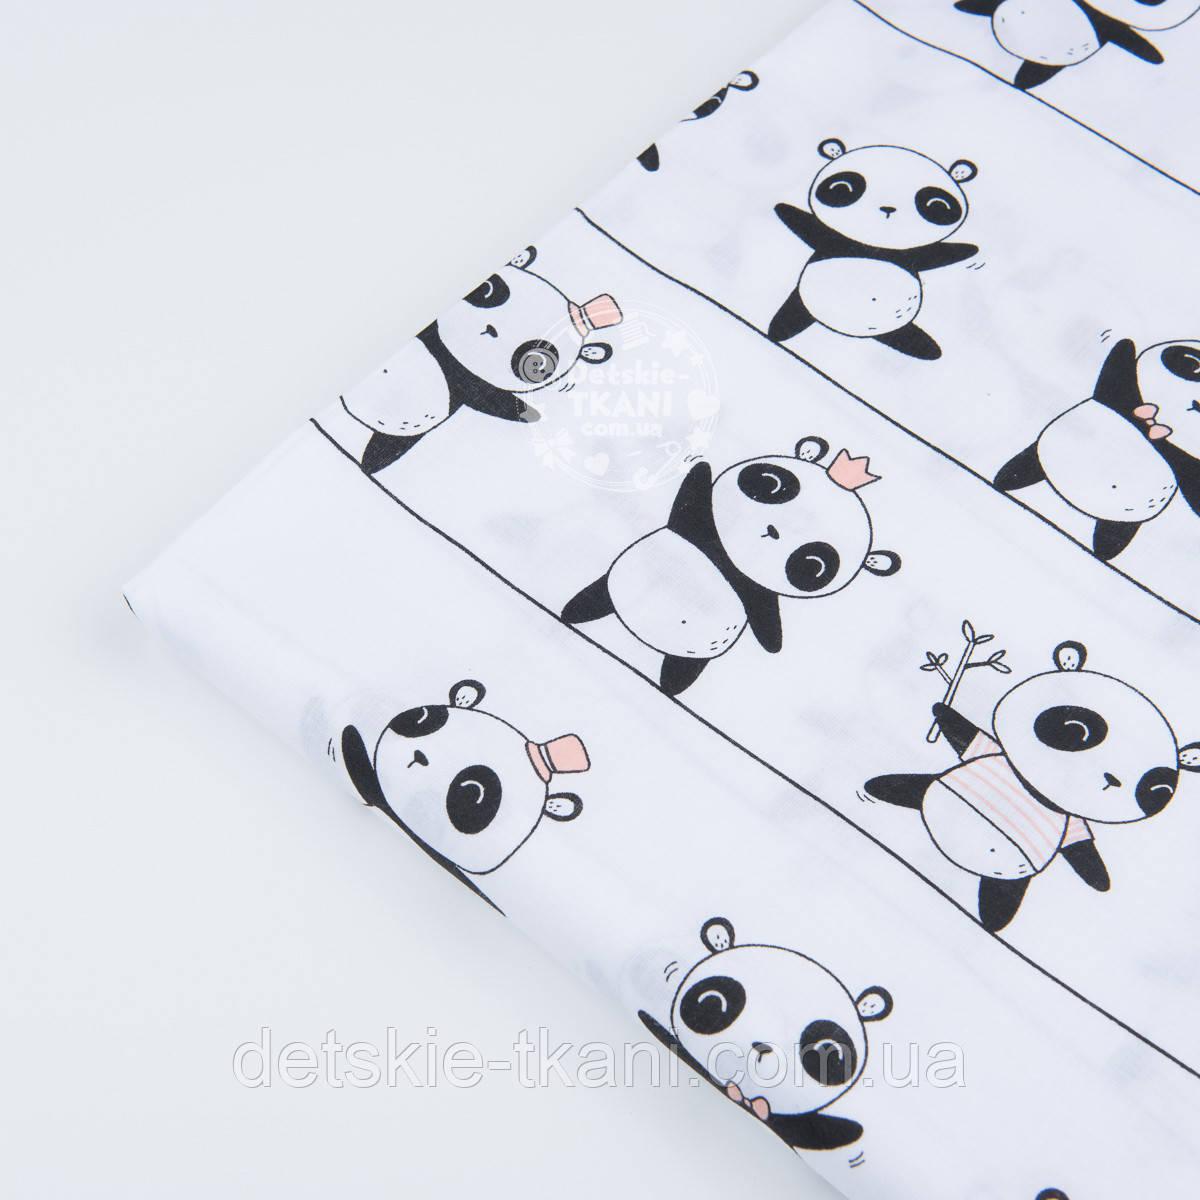 "Отрез ткани ""Панды на линиях"" на белом фоне  №1227а, размер 67*160"